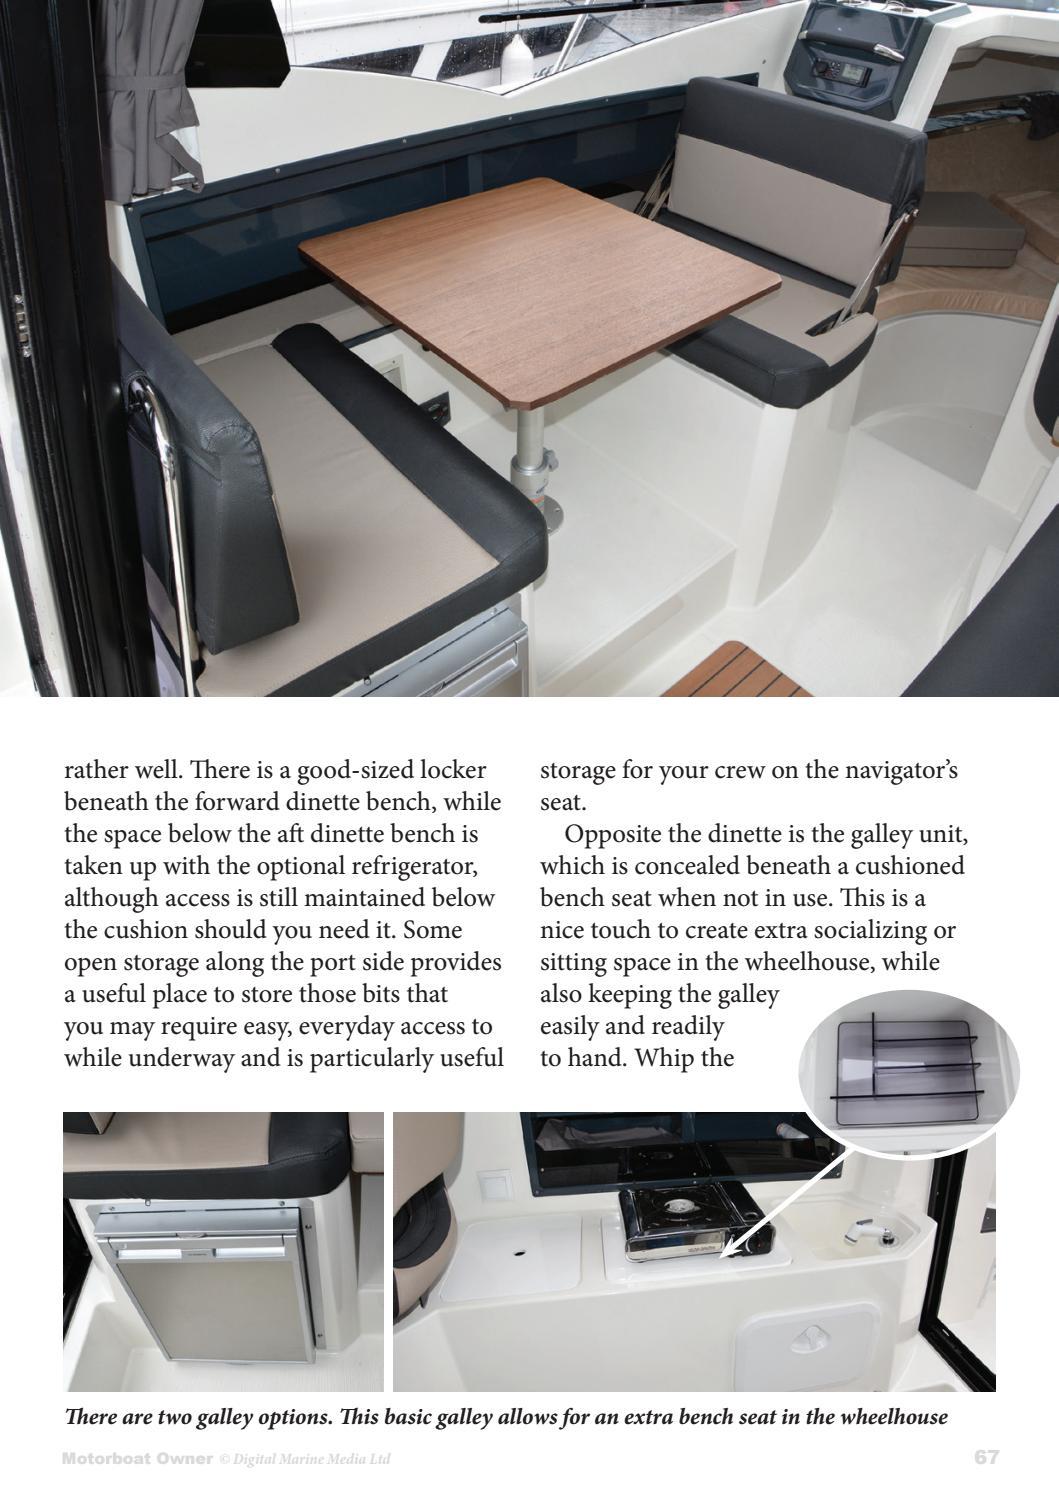 Swell Motorboat Owner July 2018 By Digital Marine Media Ltd Issuu Inzonedesignstudio Interior Chair Design Inzonedesignstudiocom